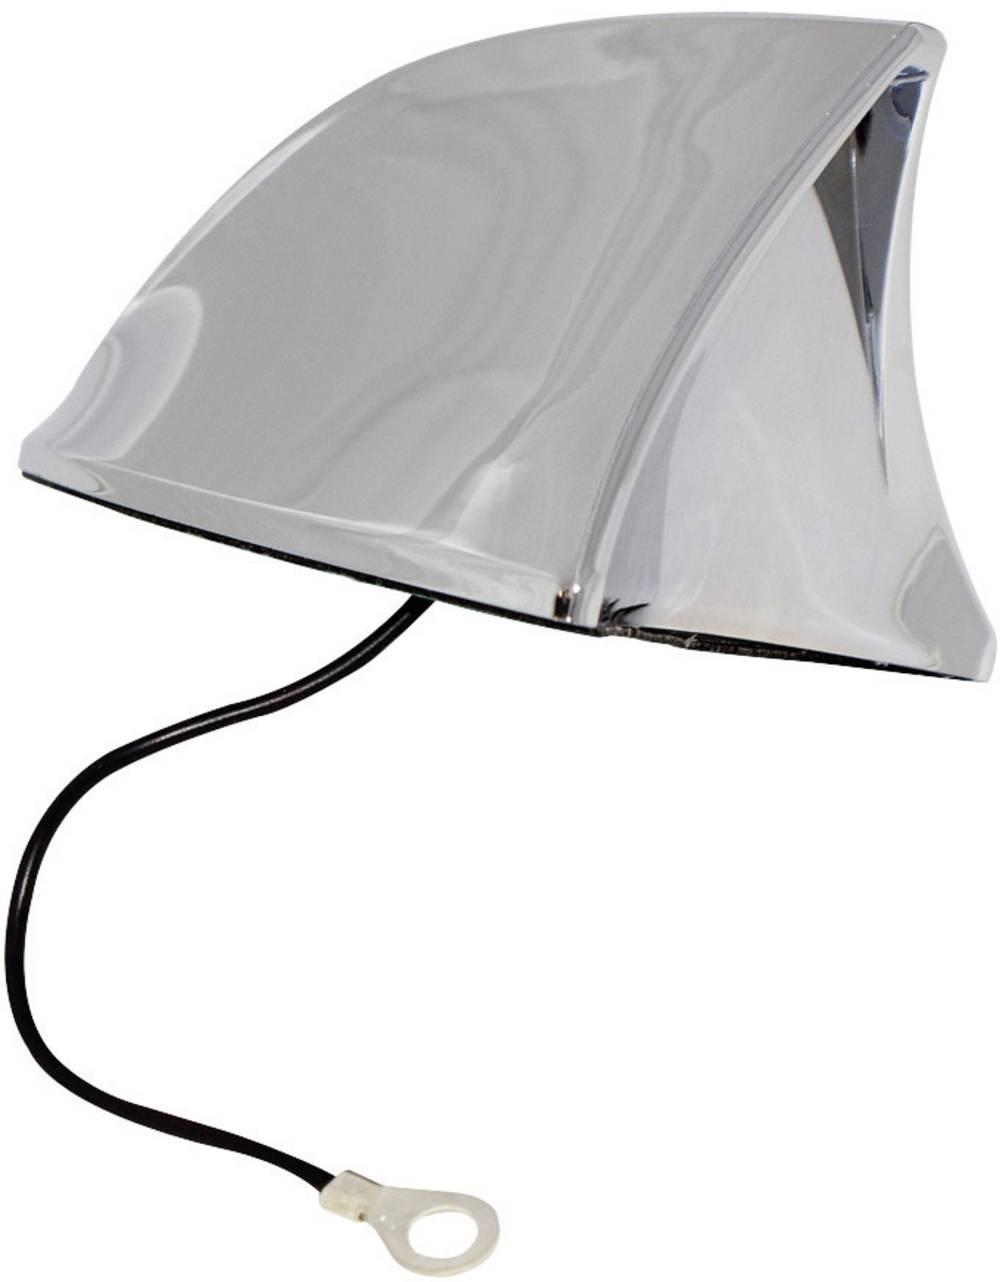 Antena iz umetne mase Eufab Shark, krom 521201